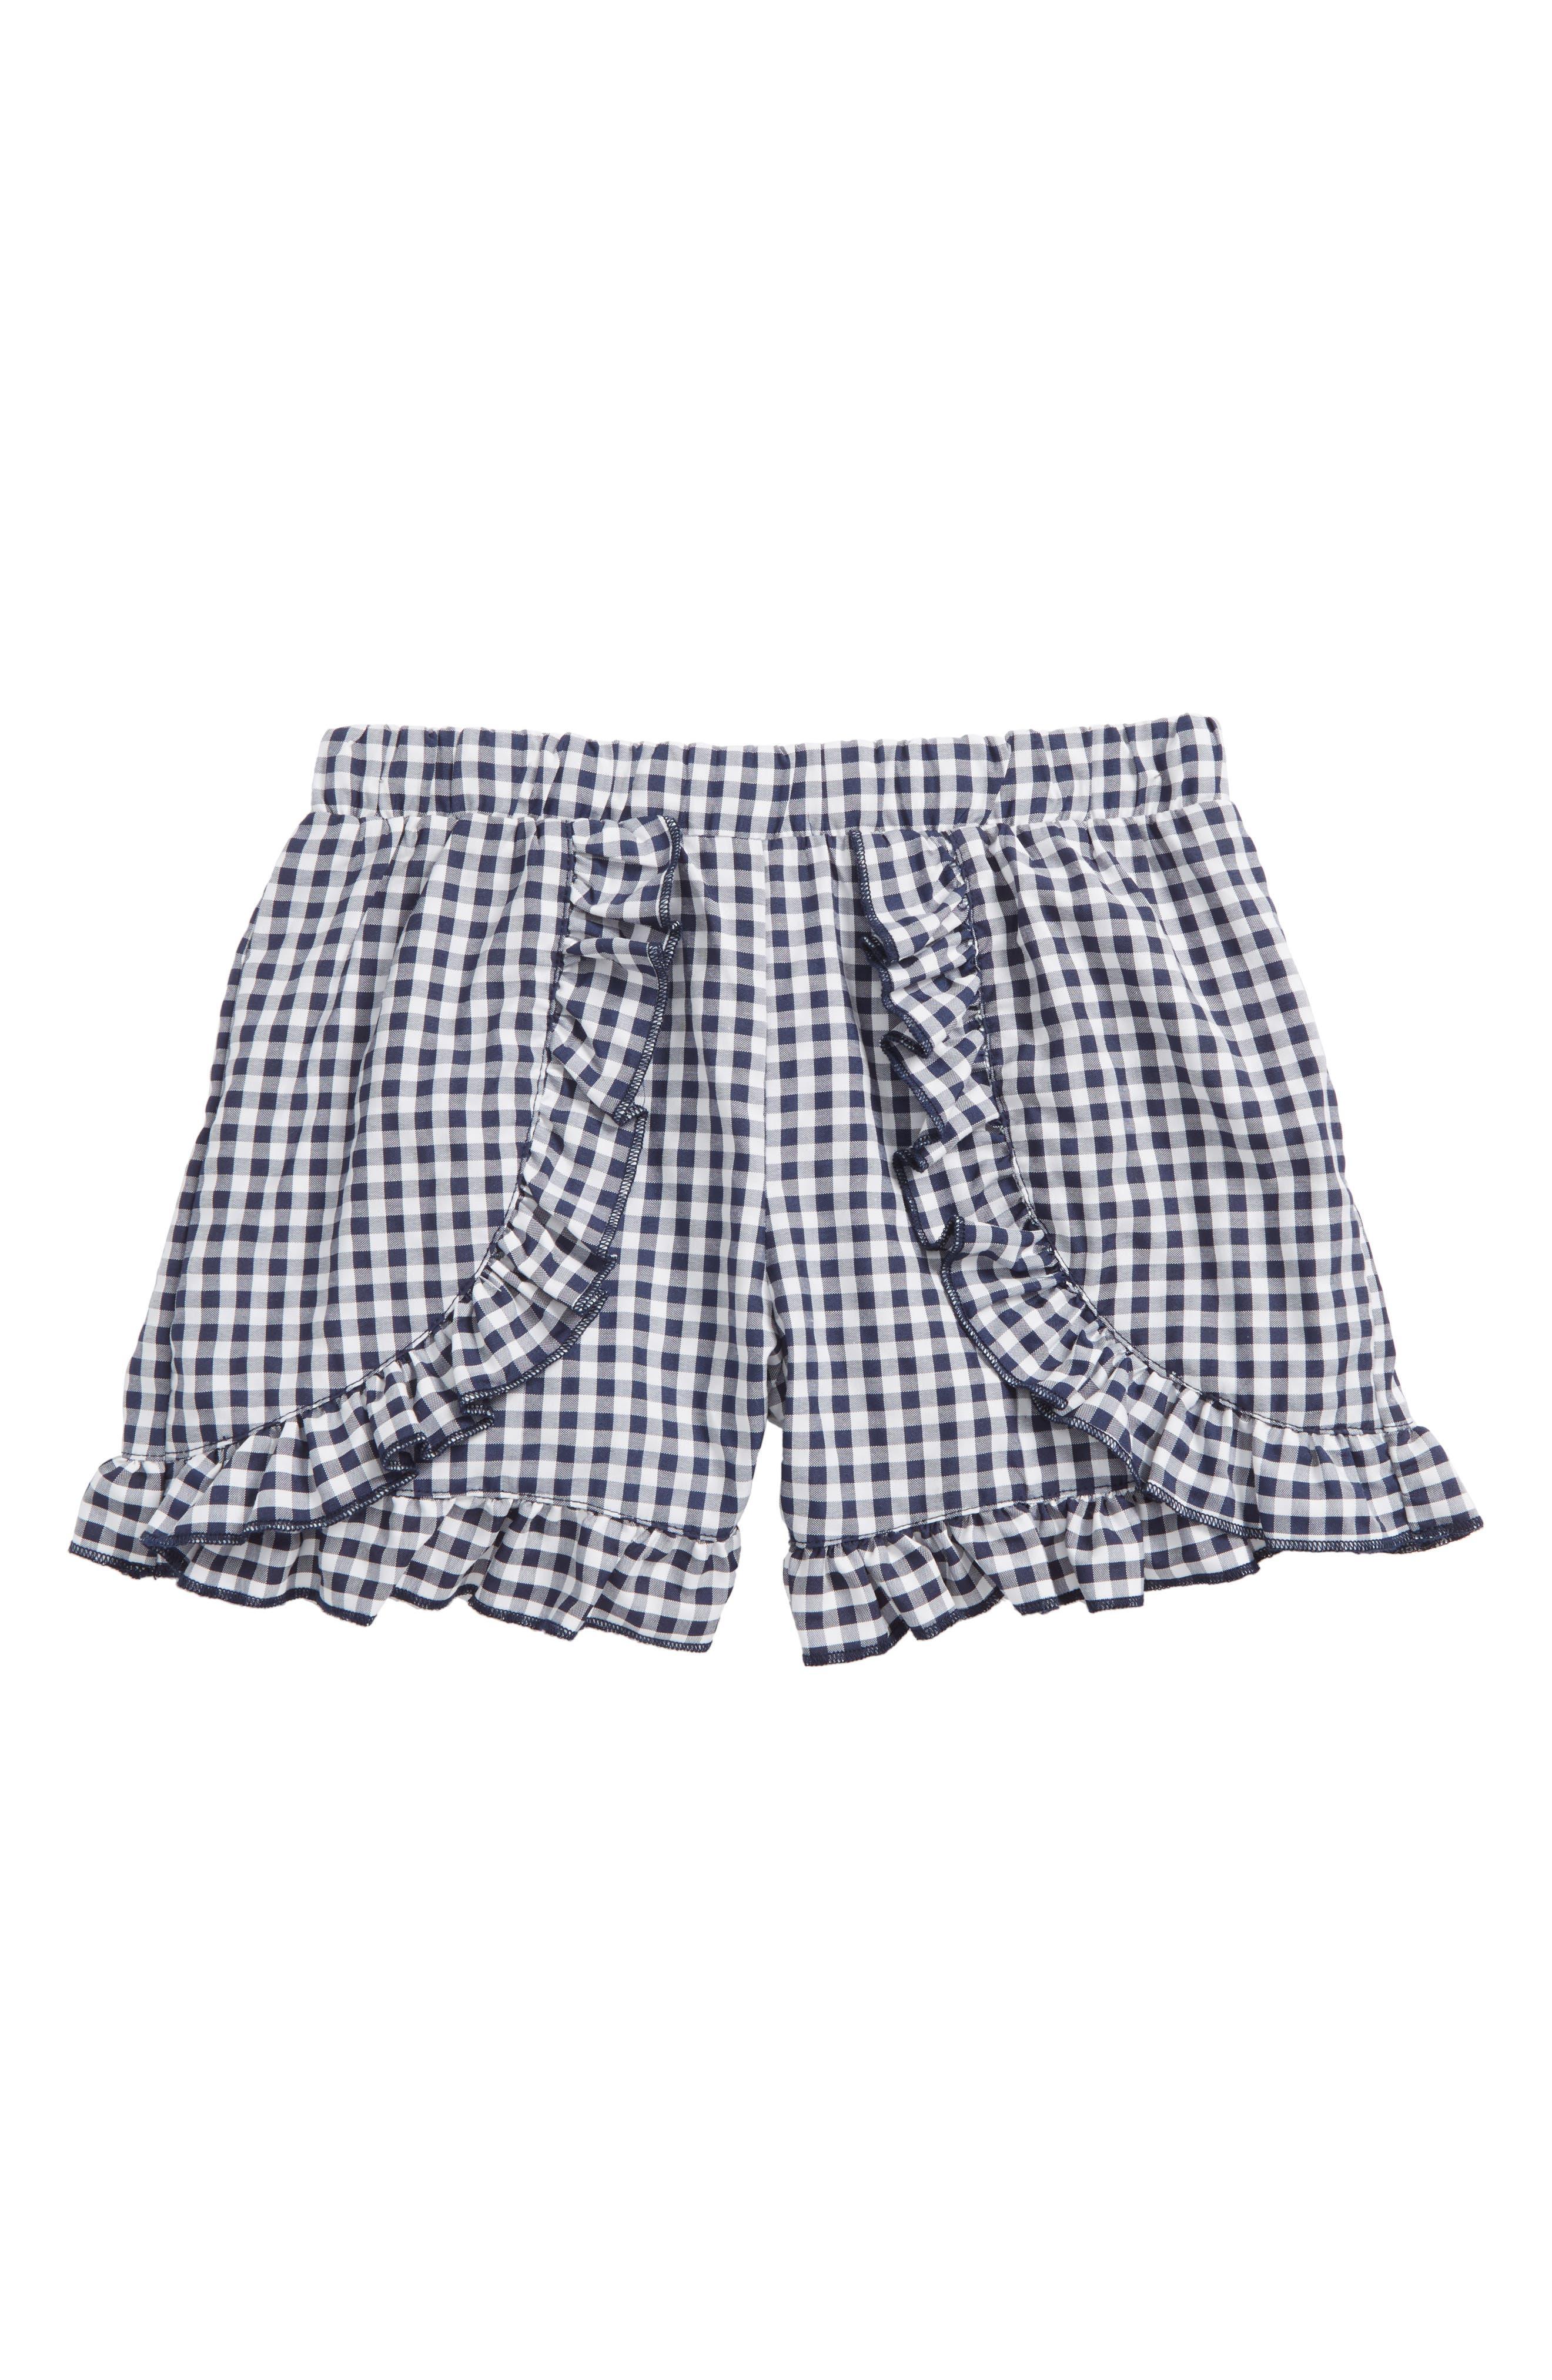 Ruffle Gingham Shorts,                         Main,                         color, Navy White